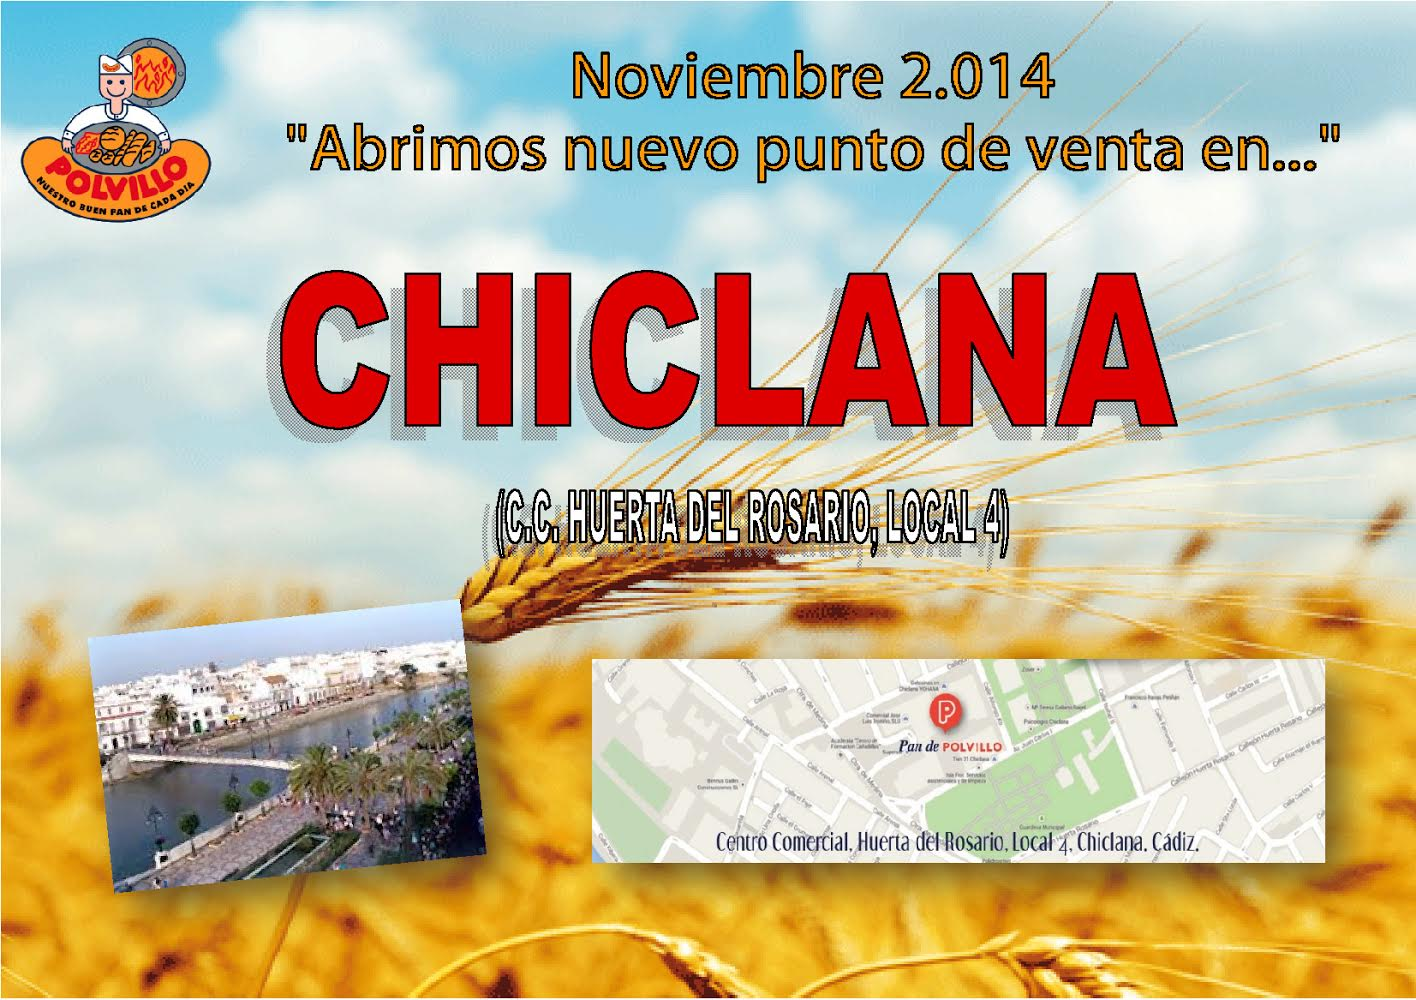 Apertura Chiclana, CC Huerta del Rosario, local 4